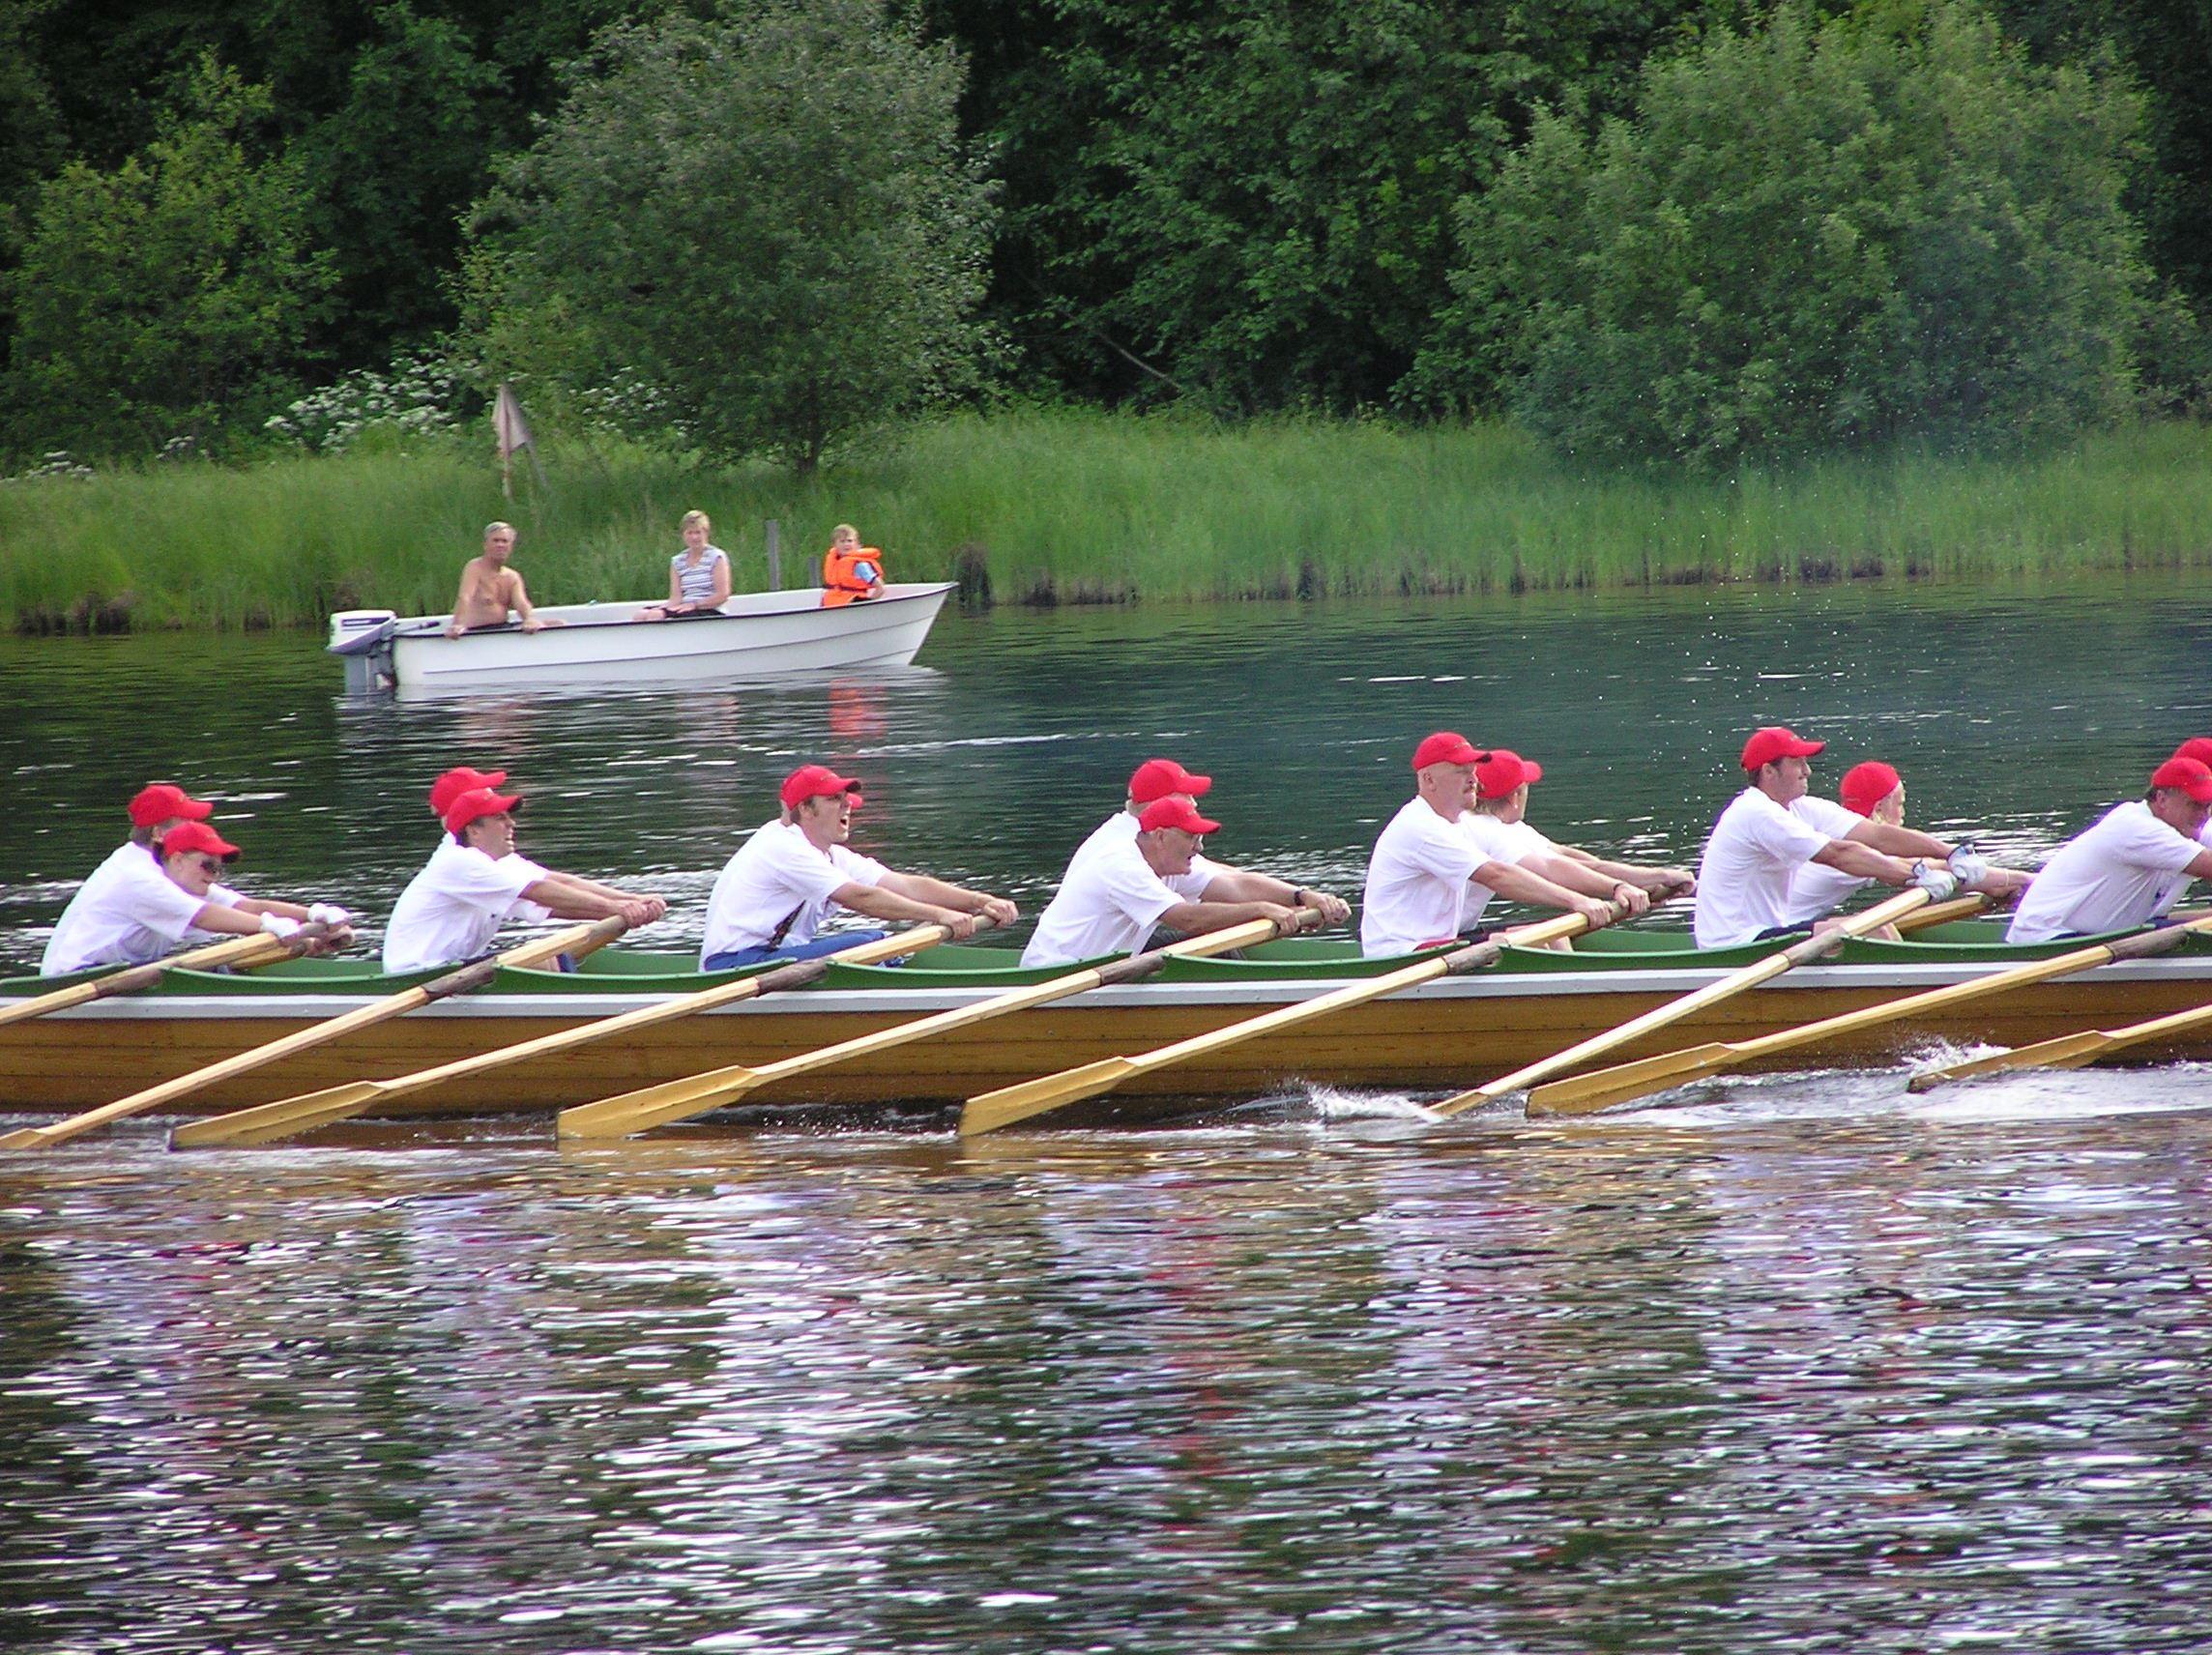 Church Boat Race, Leksand